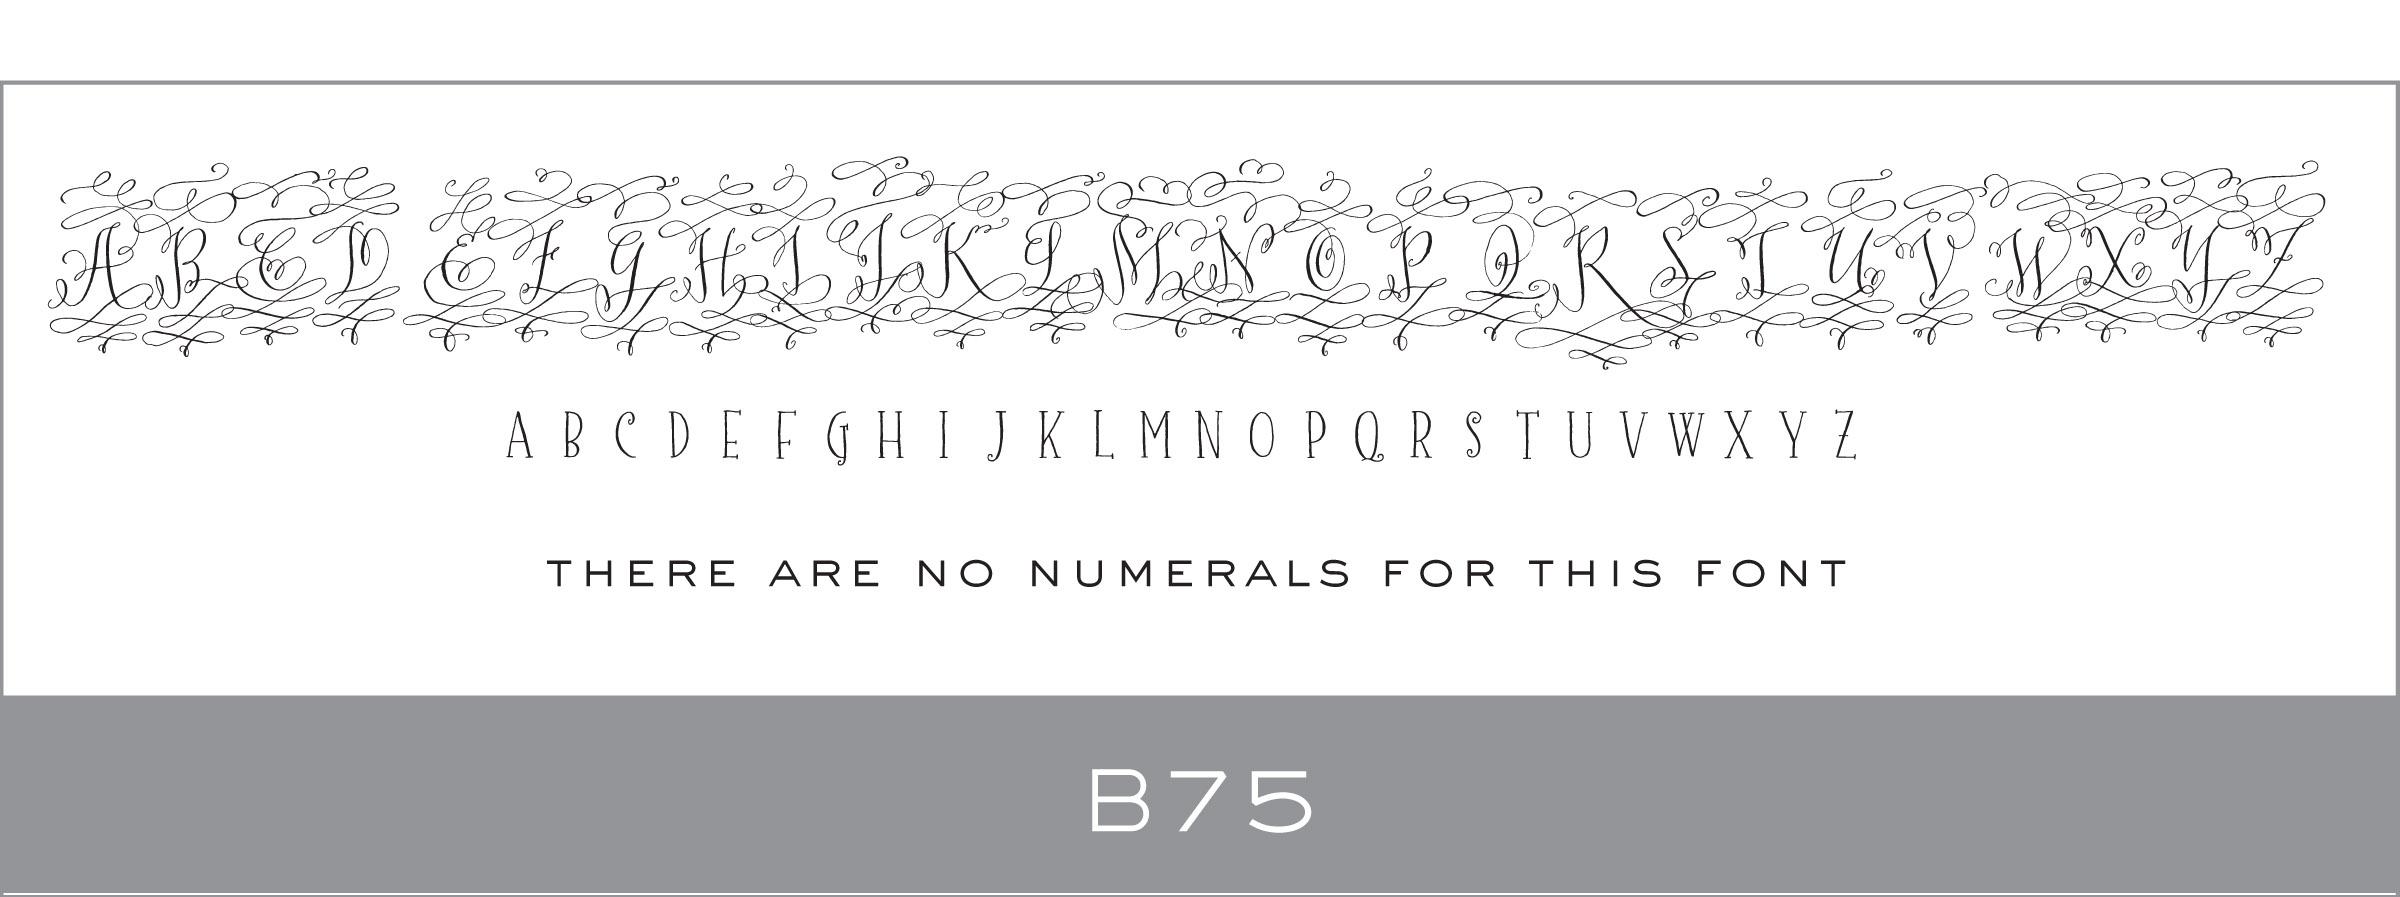 B75_Haute_Papier_Font.jpg